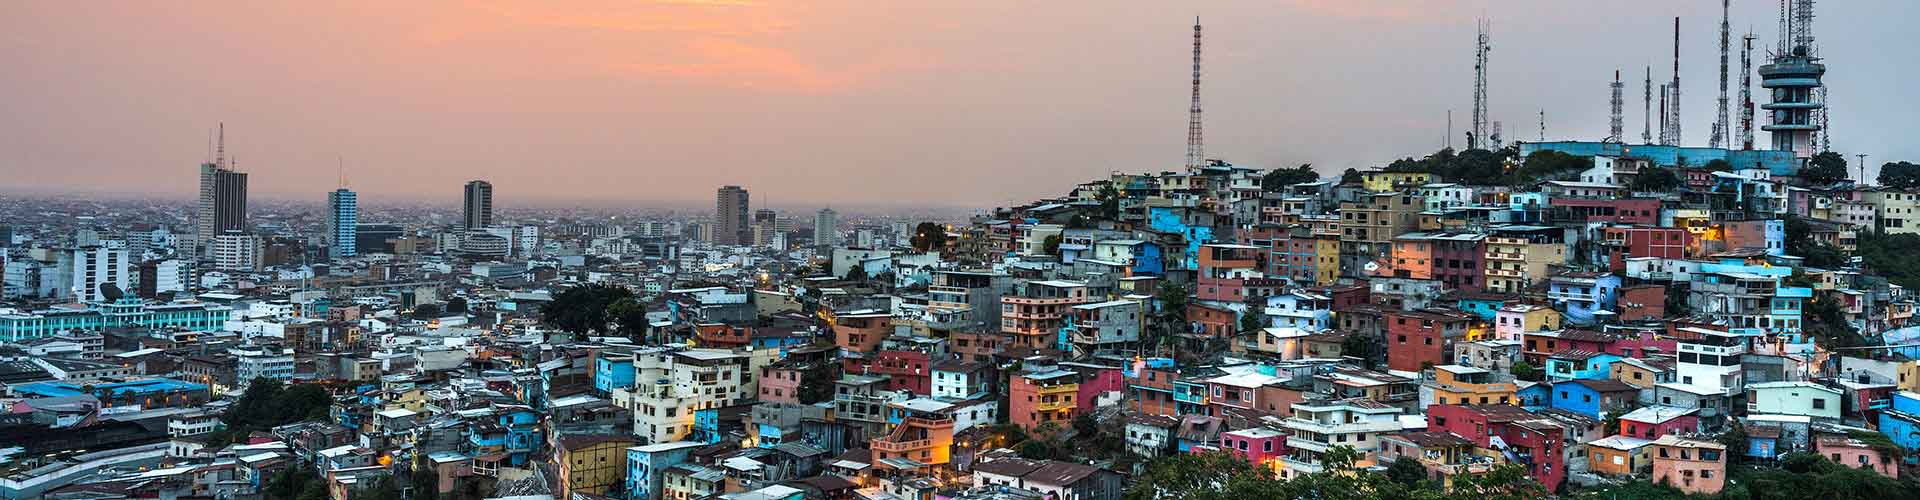 Guayaquil - Apartamentos en Guayaquil. Mapas de Guayaquil, Fotos y comentarios de cada Apartamento en Guayaquil.